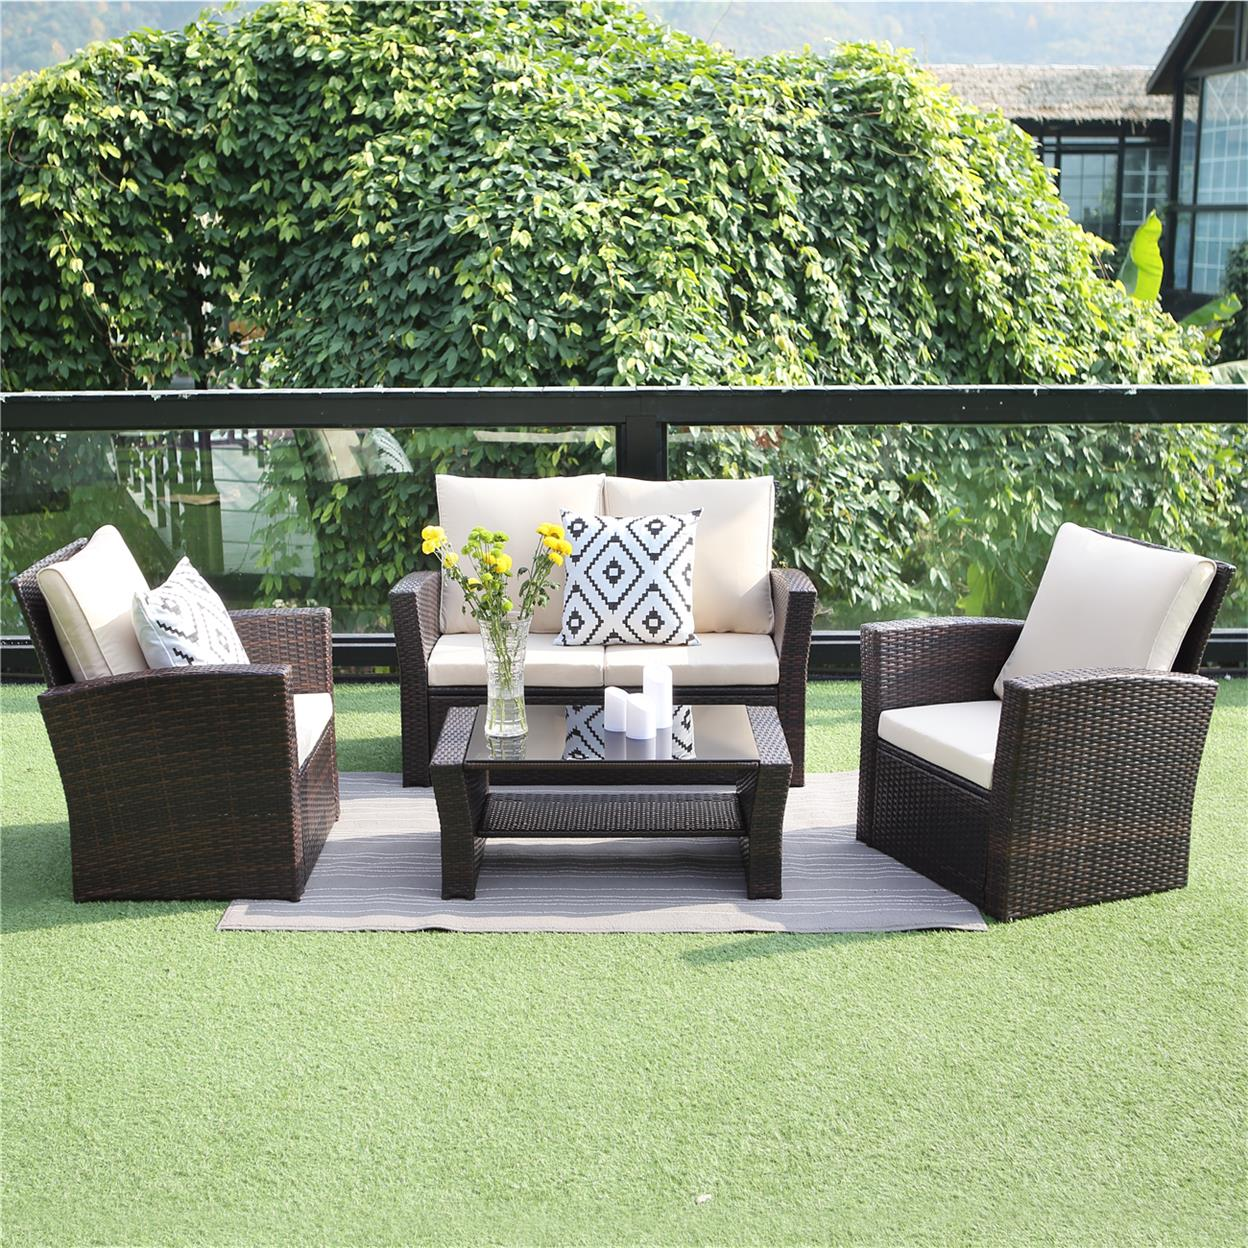 outdoor patio furniture set wisteria lane 4 piece garden rattan sofa wicker sectional sofa seat with coffee table brown